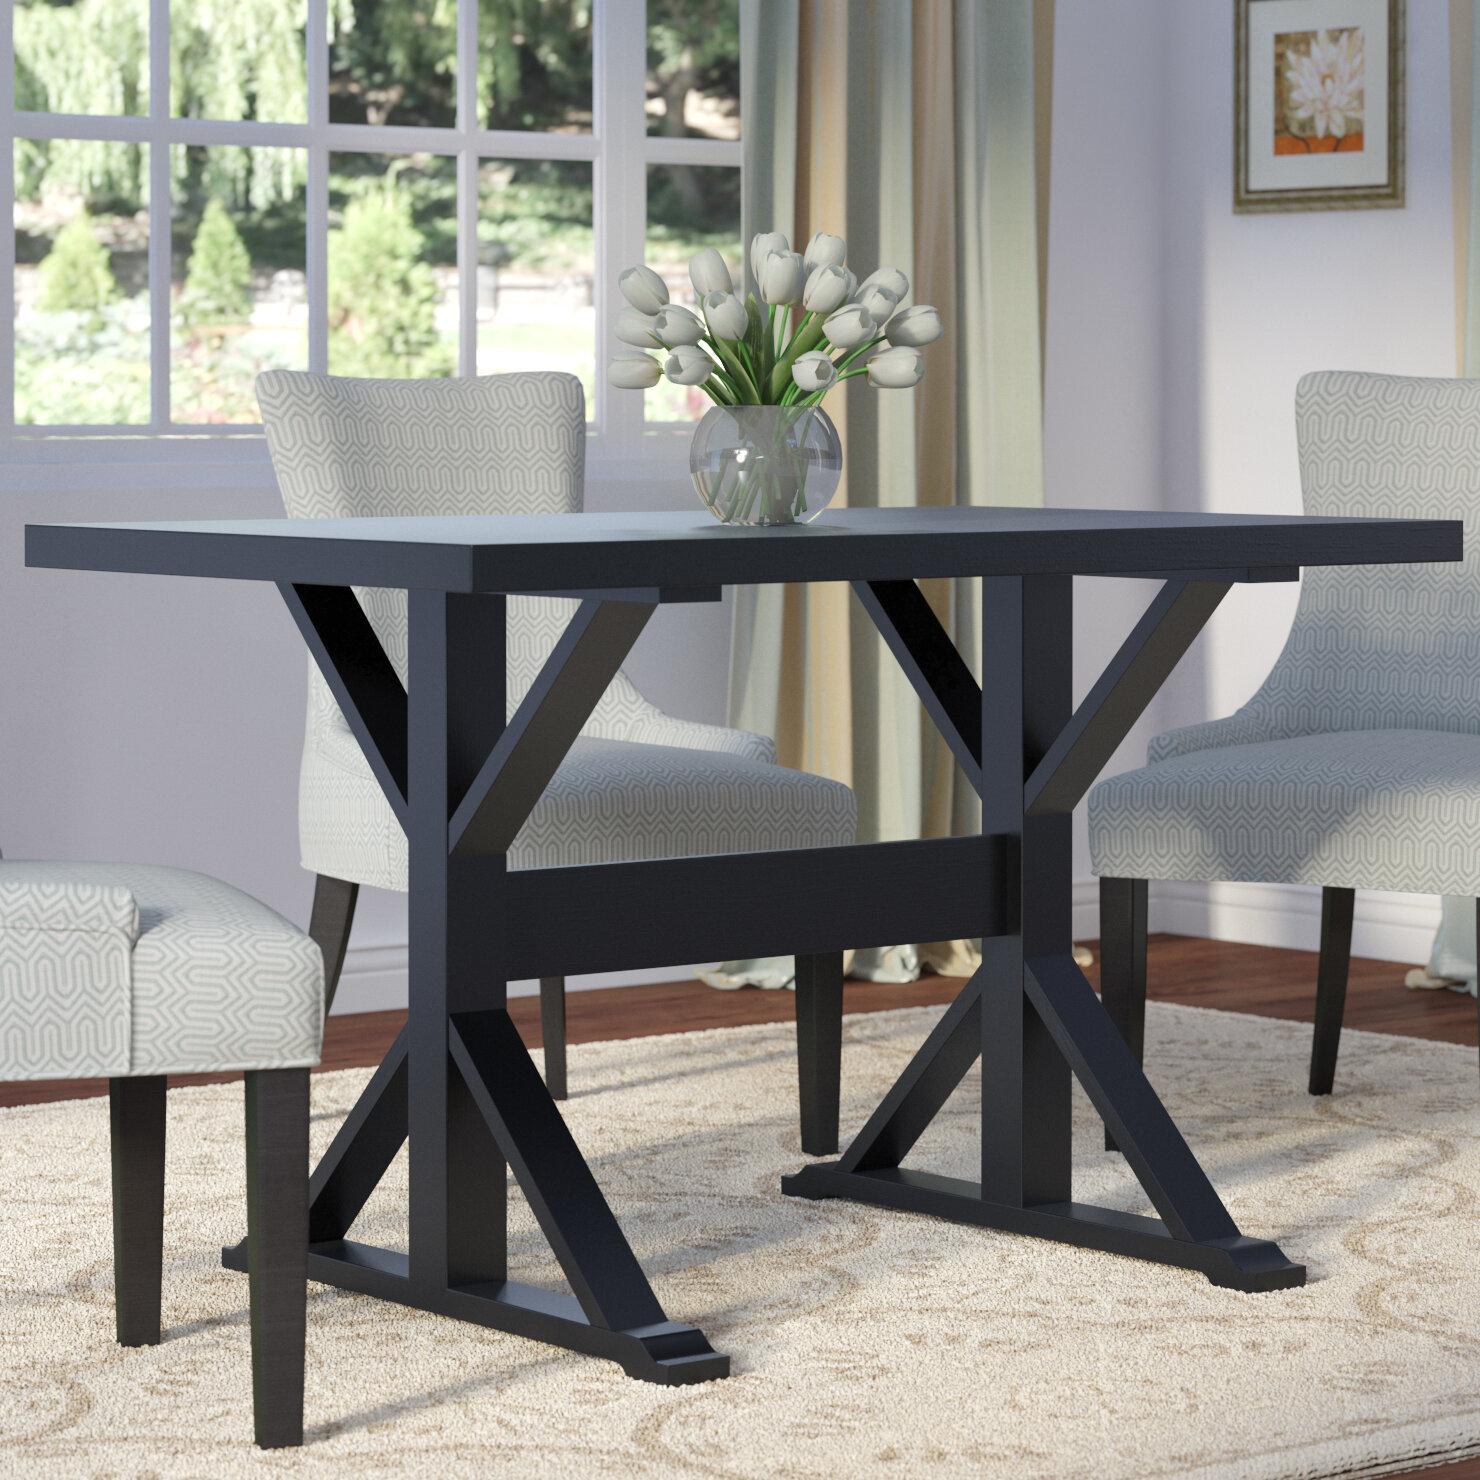 Alcott Hill Maelynn Dining Table Reviews